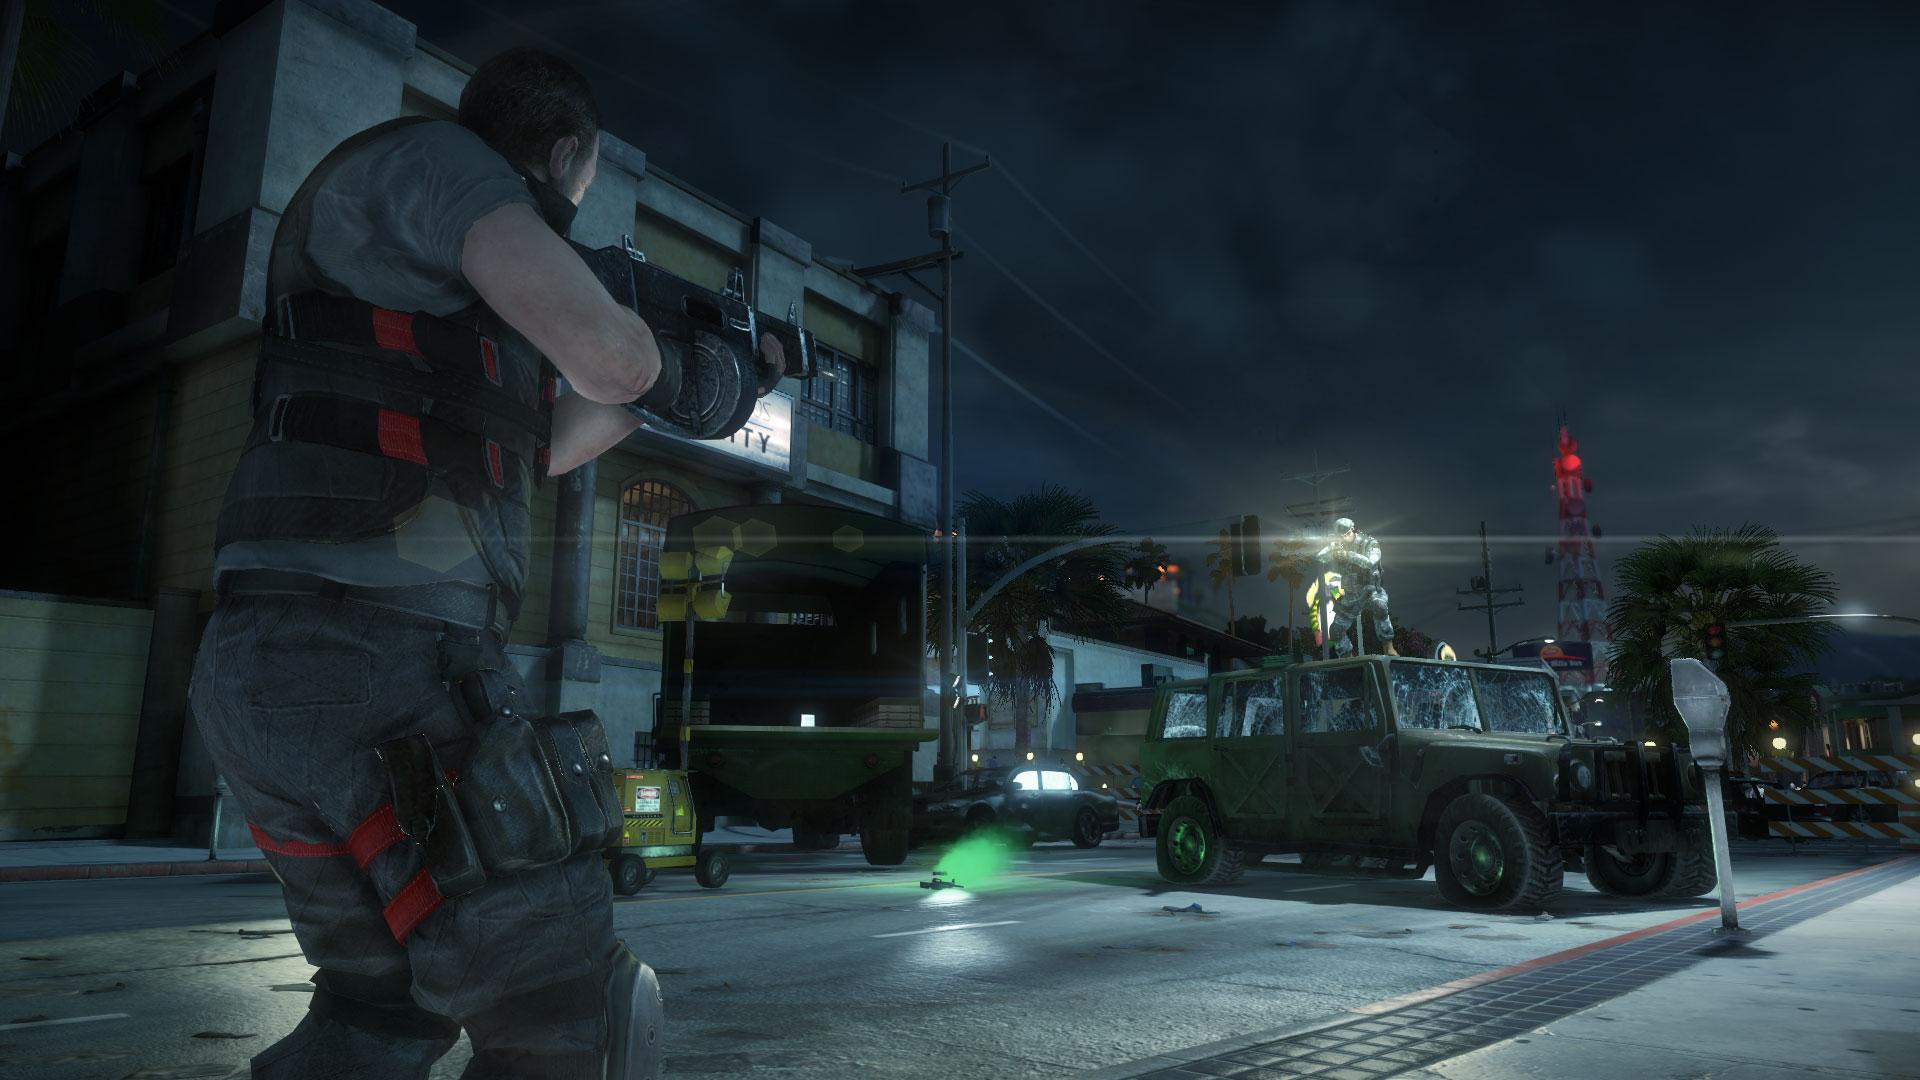 Dead-Rising-3-Operation-Broken-Eagle-screenshot-6